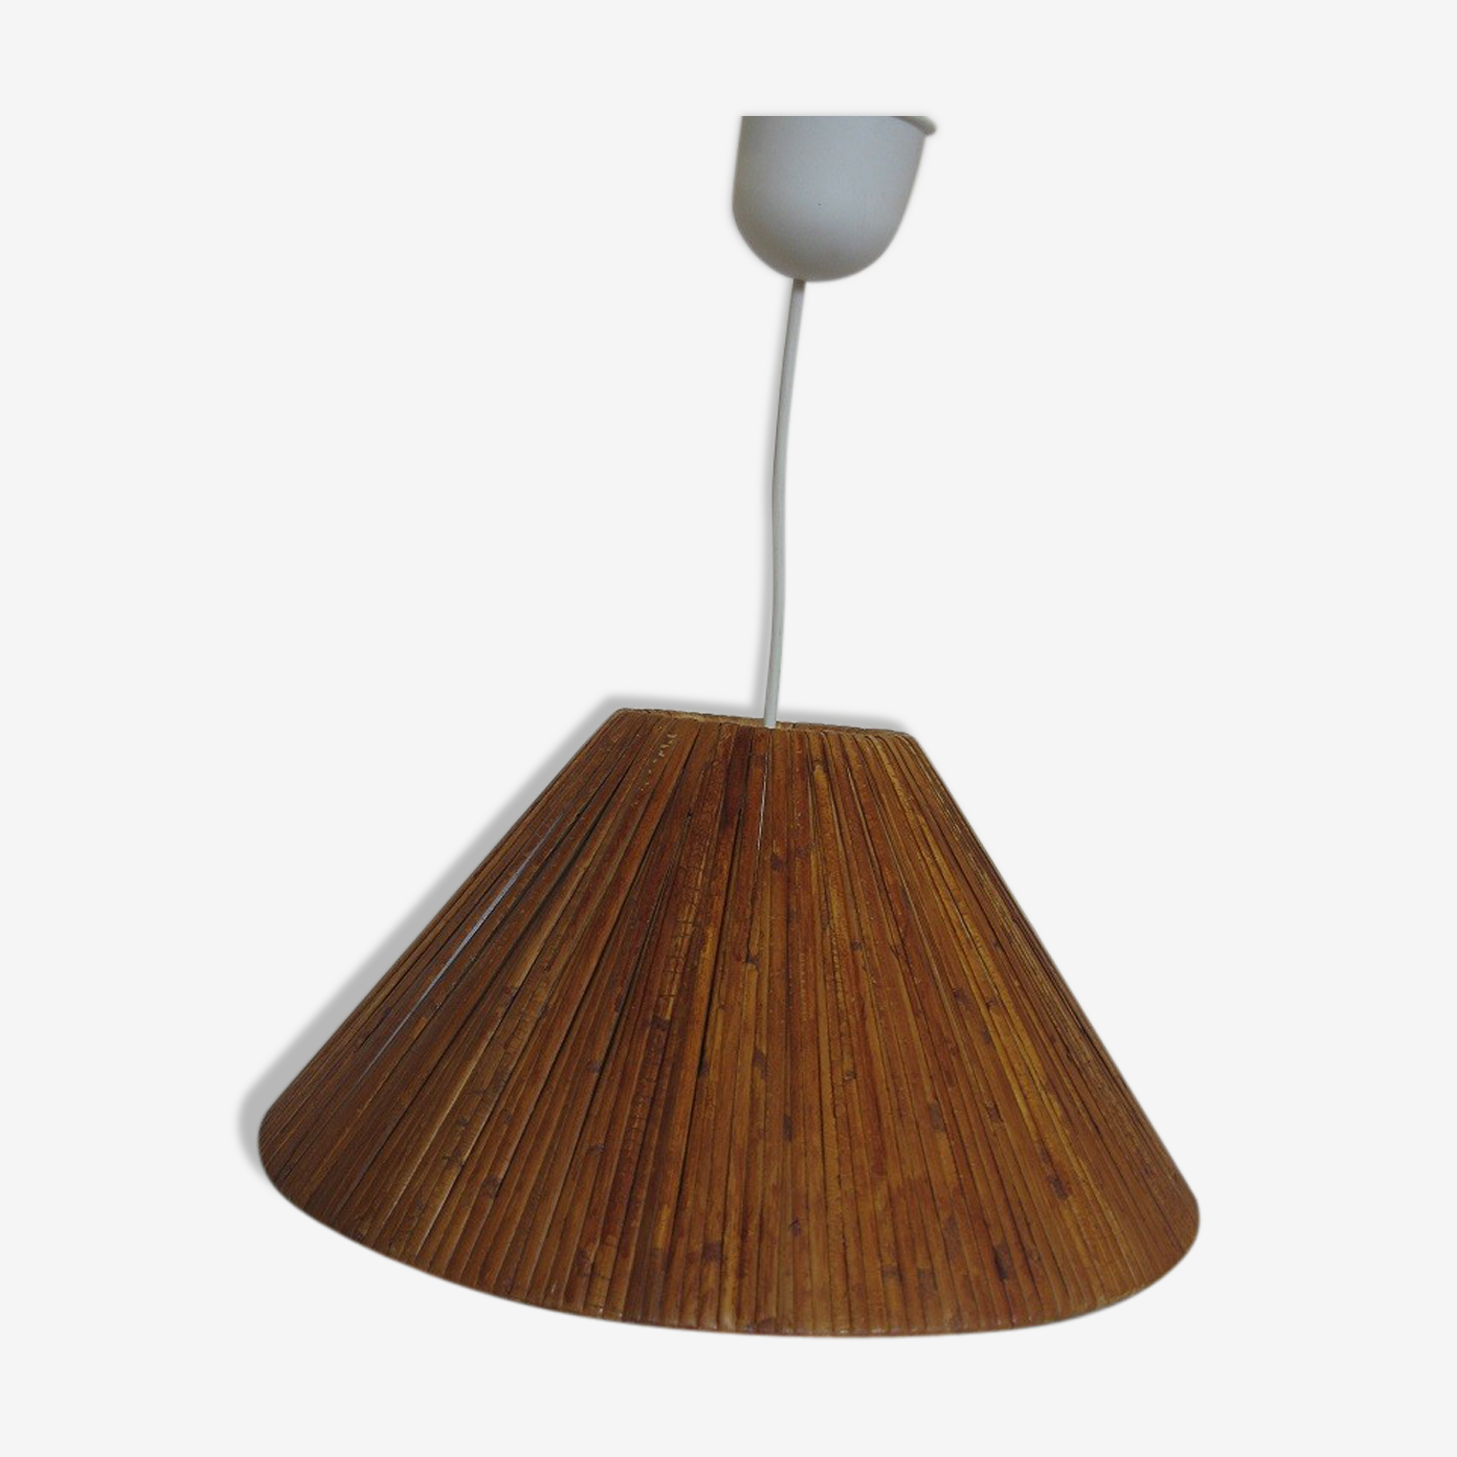 Wicker hanging lamp